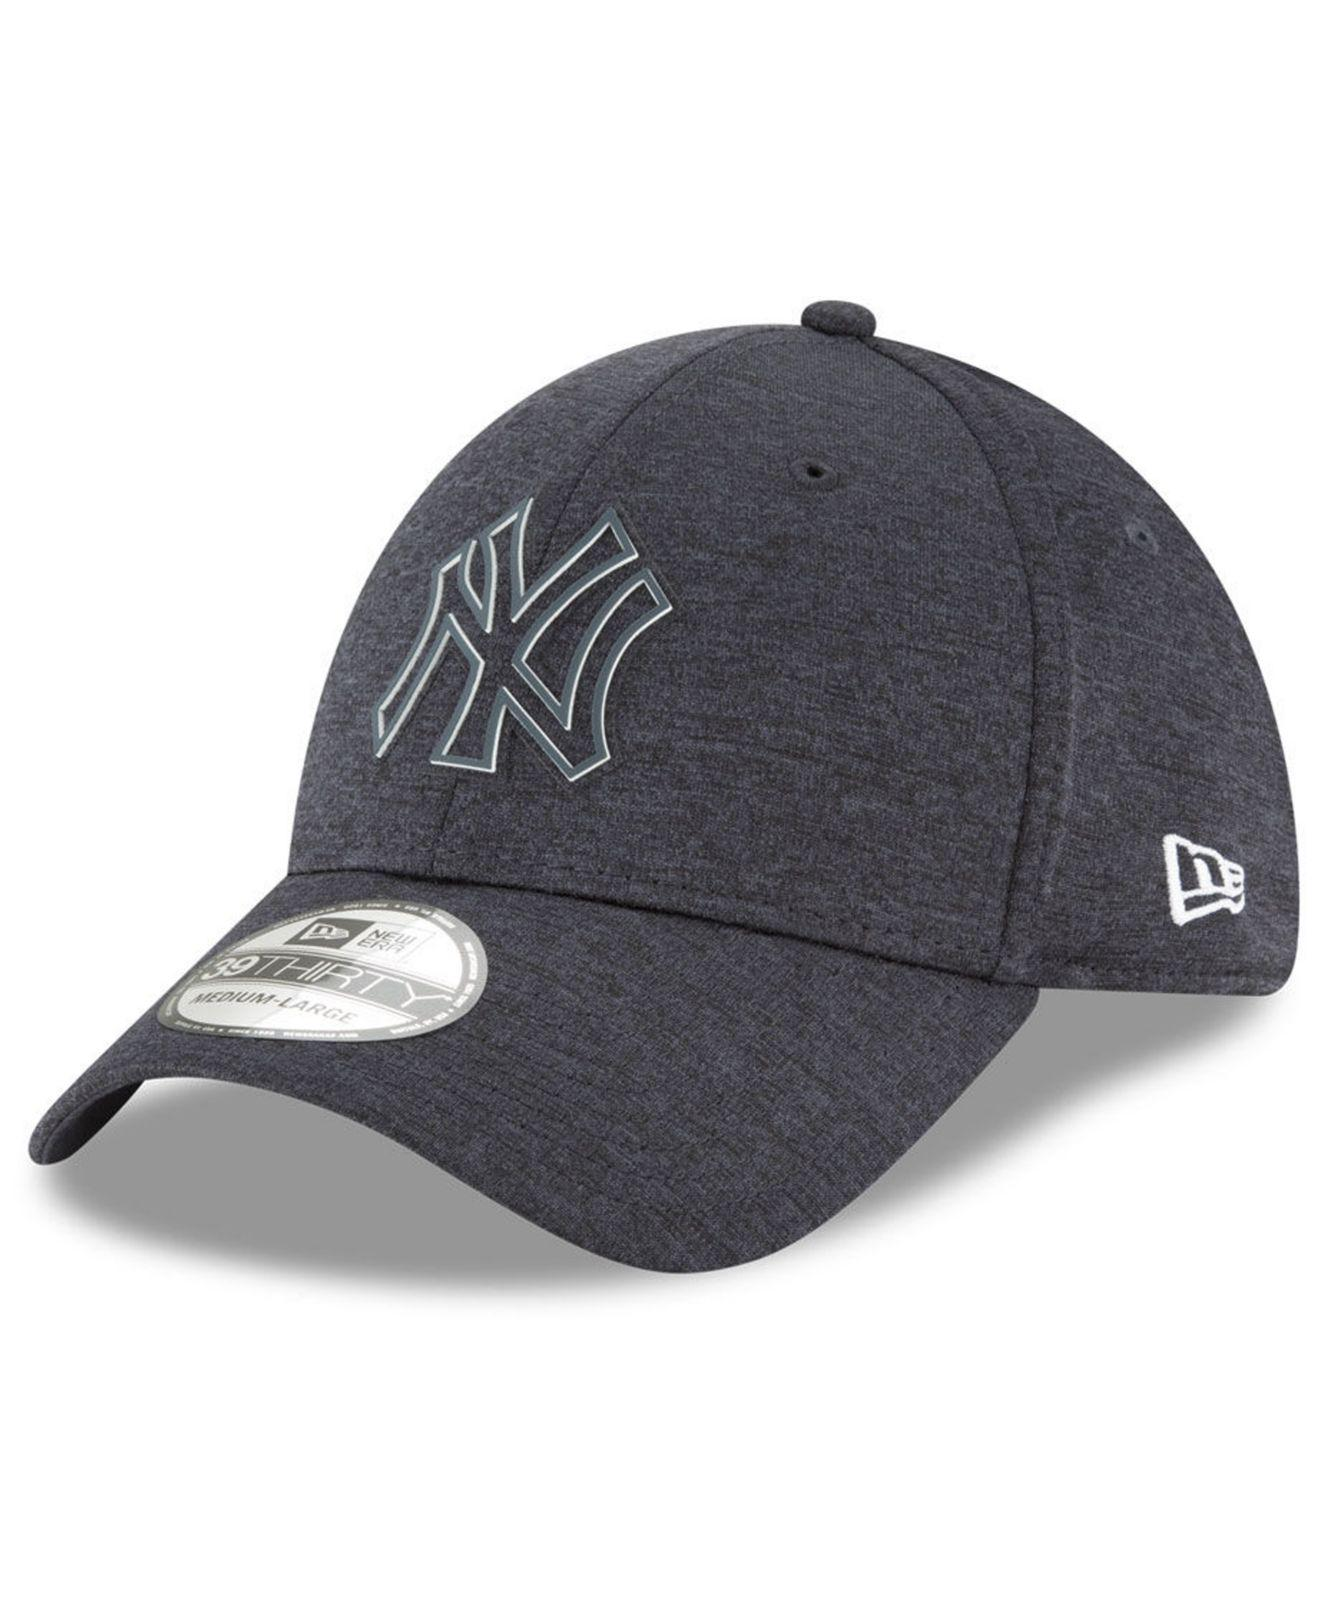 679beee16 ... good navy osfa new york yankees clubhouse 39thirty cap for men lyst.  view fullscreen 41ffa